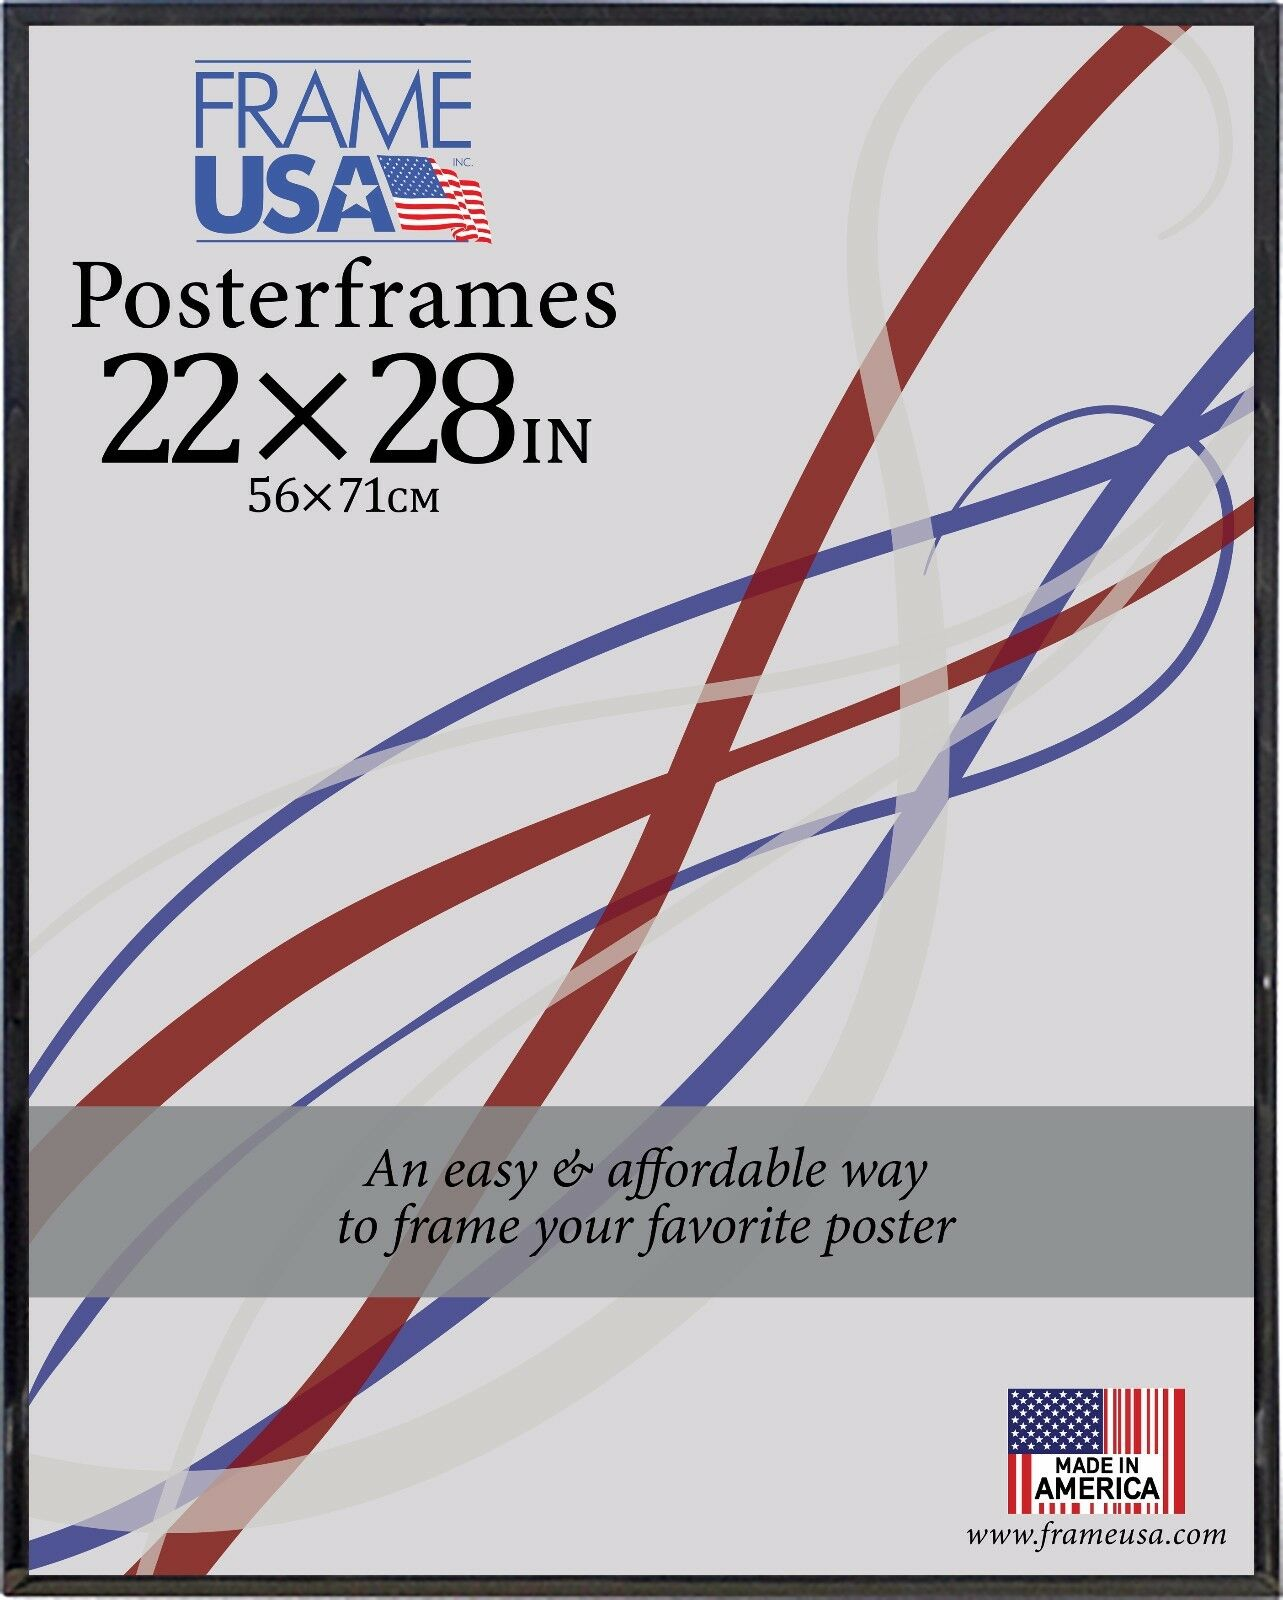 22x28 Poster Frame w/Plexi-Glass and Corrugated Backing - Av